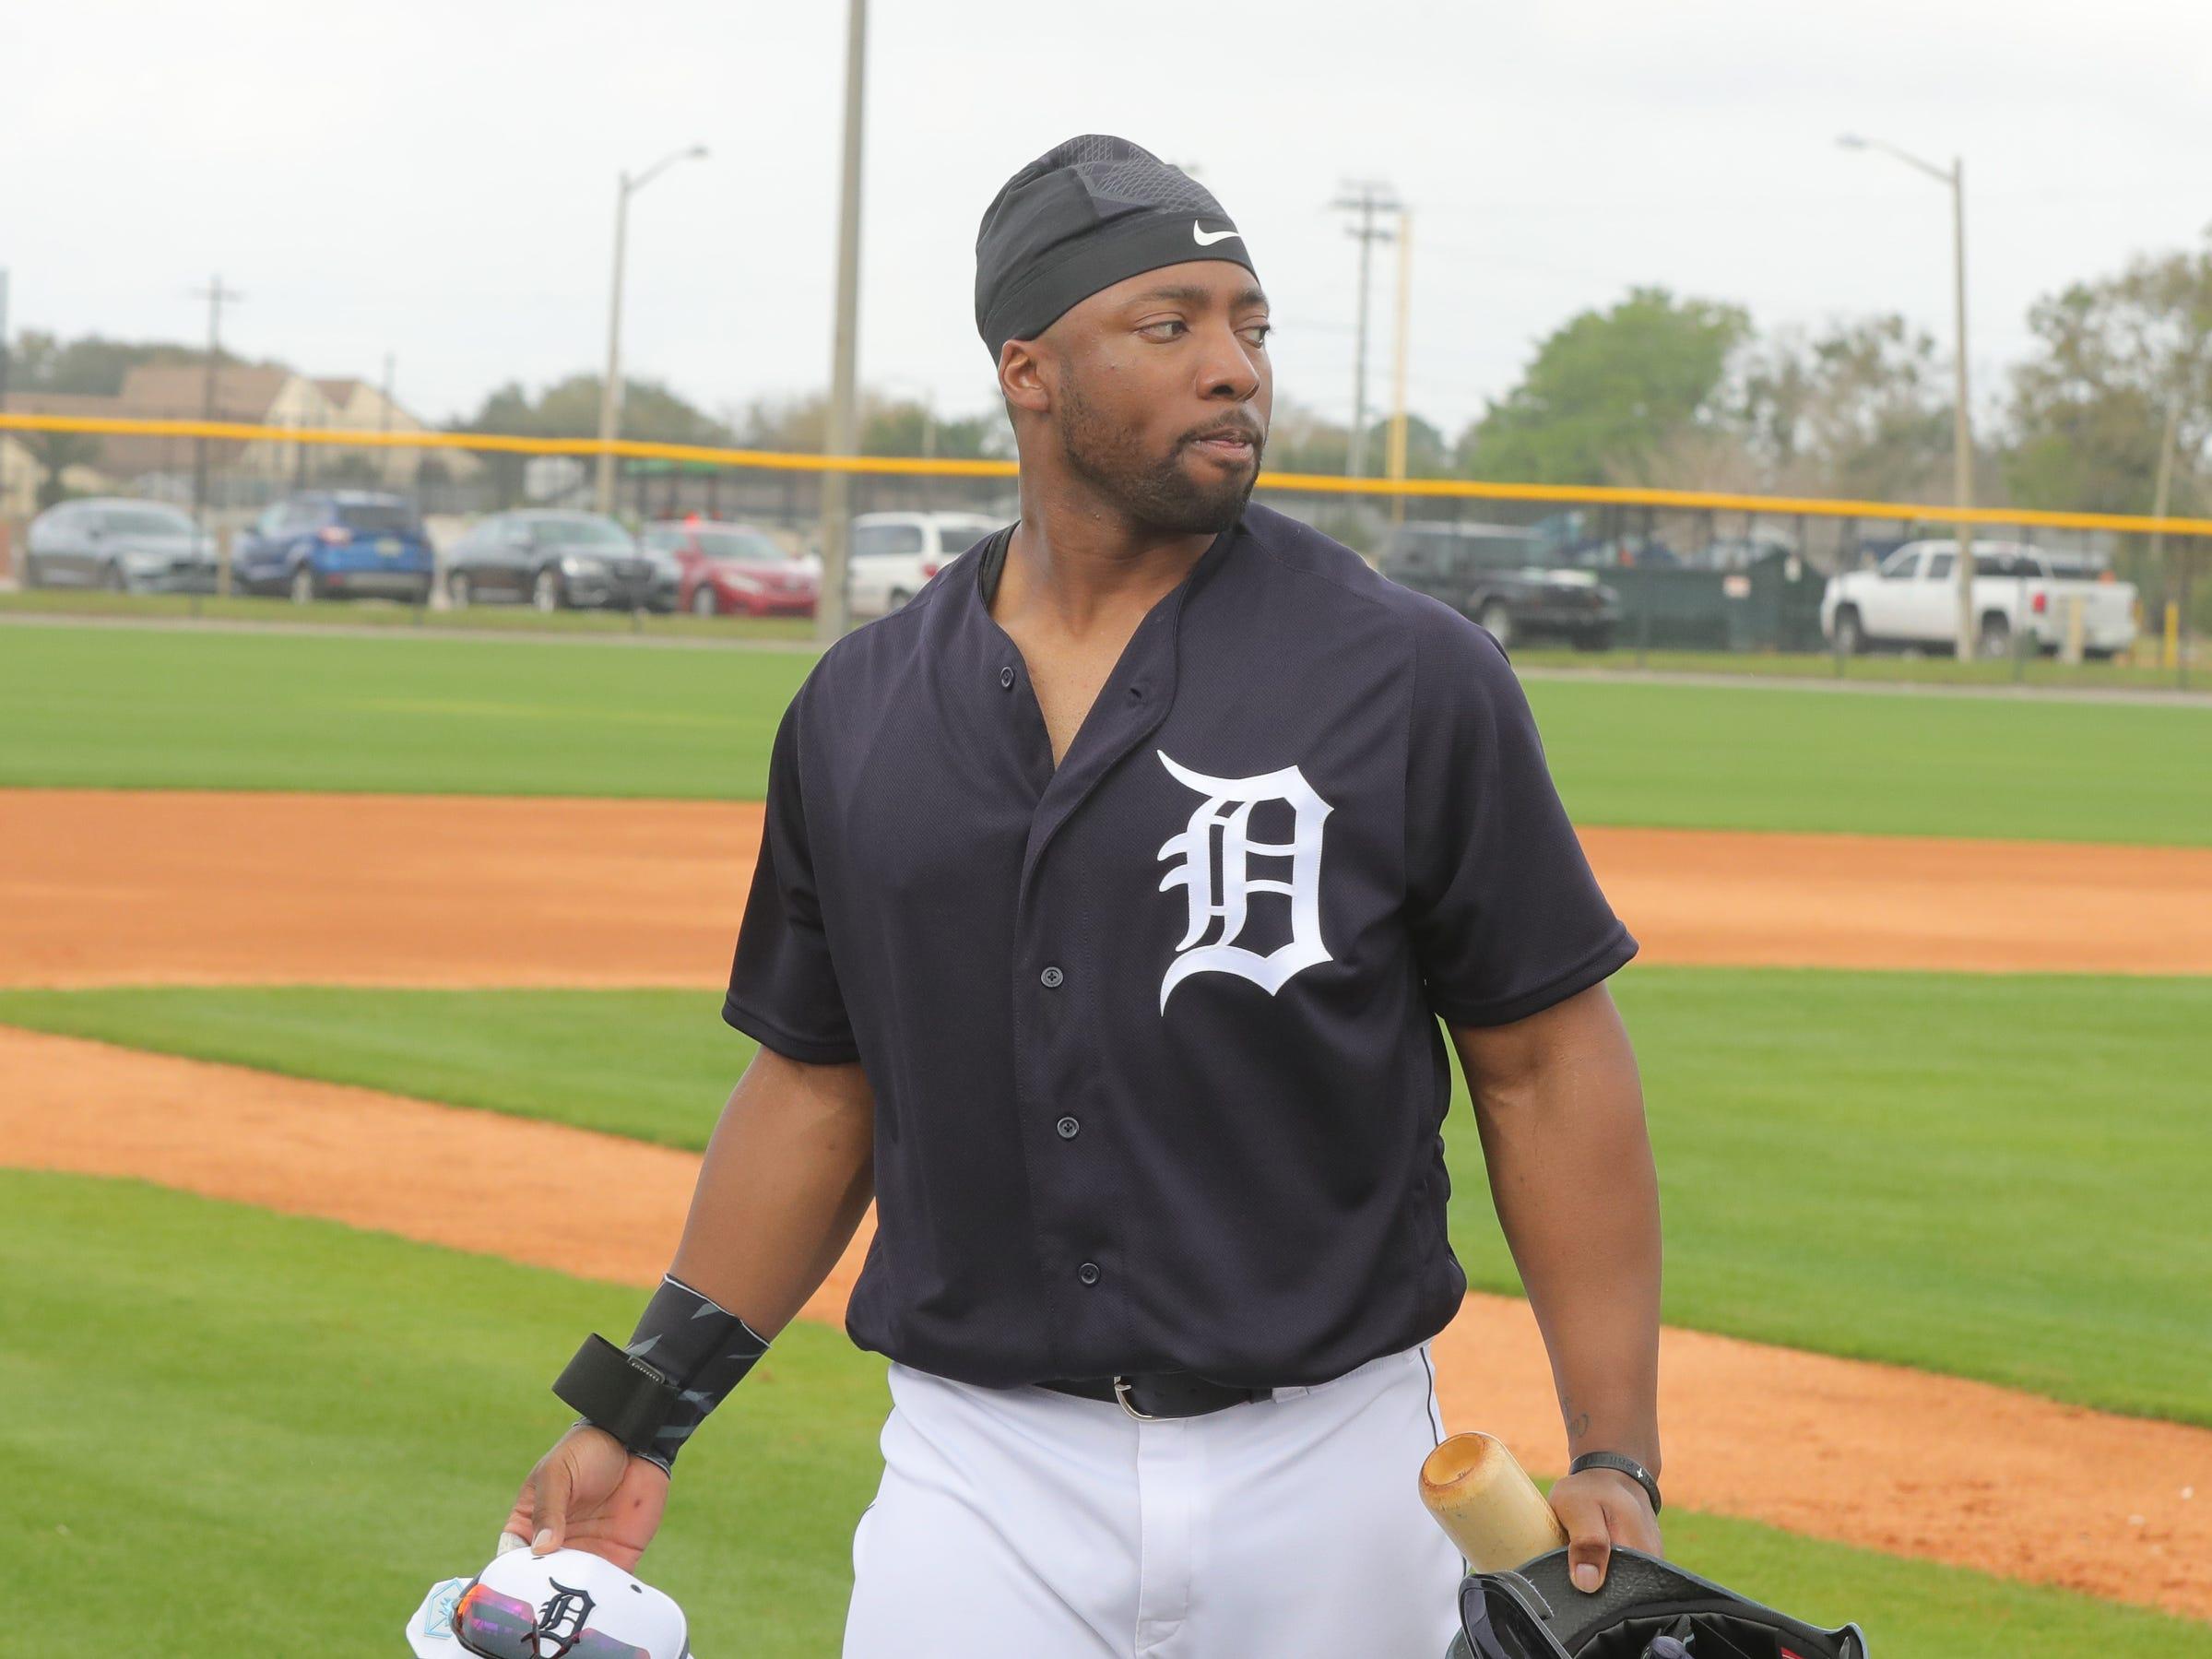 Detroit Tigers outfielder Christin Stewart prepares to bat Monday, Feb. 18, 2019 at Joker Marchant Stadium in Lakeland, Fla.